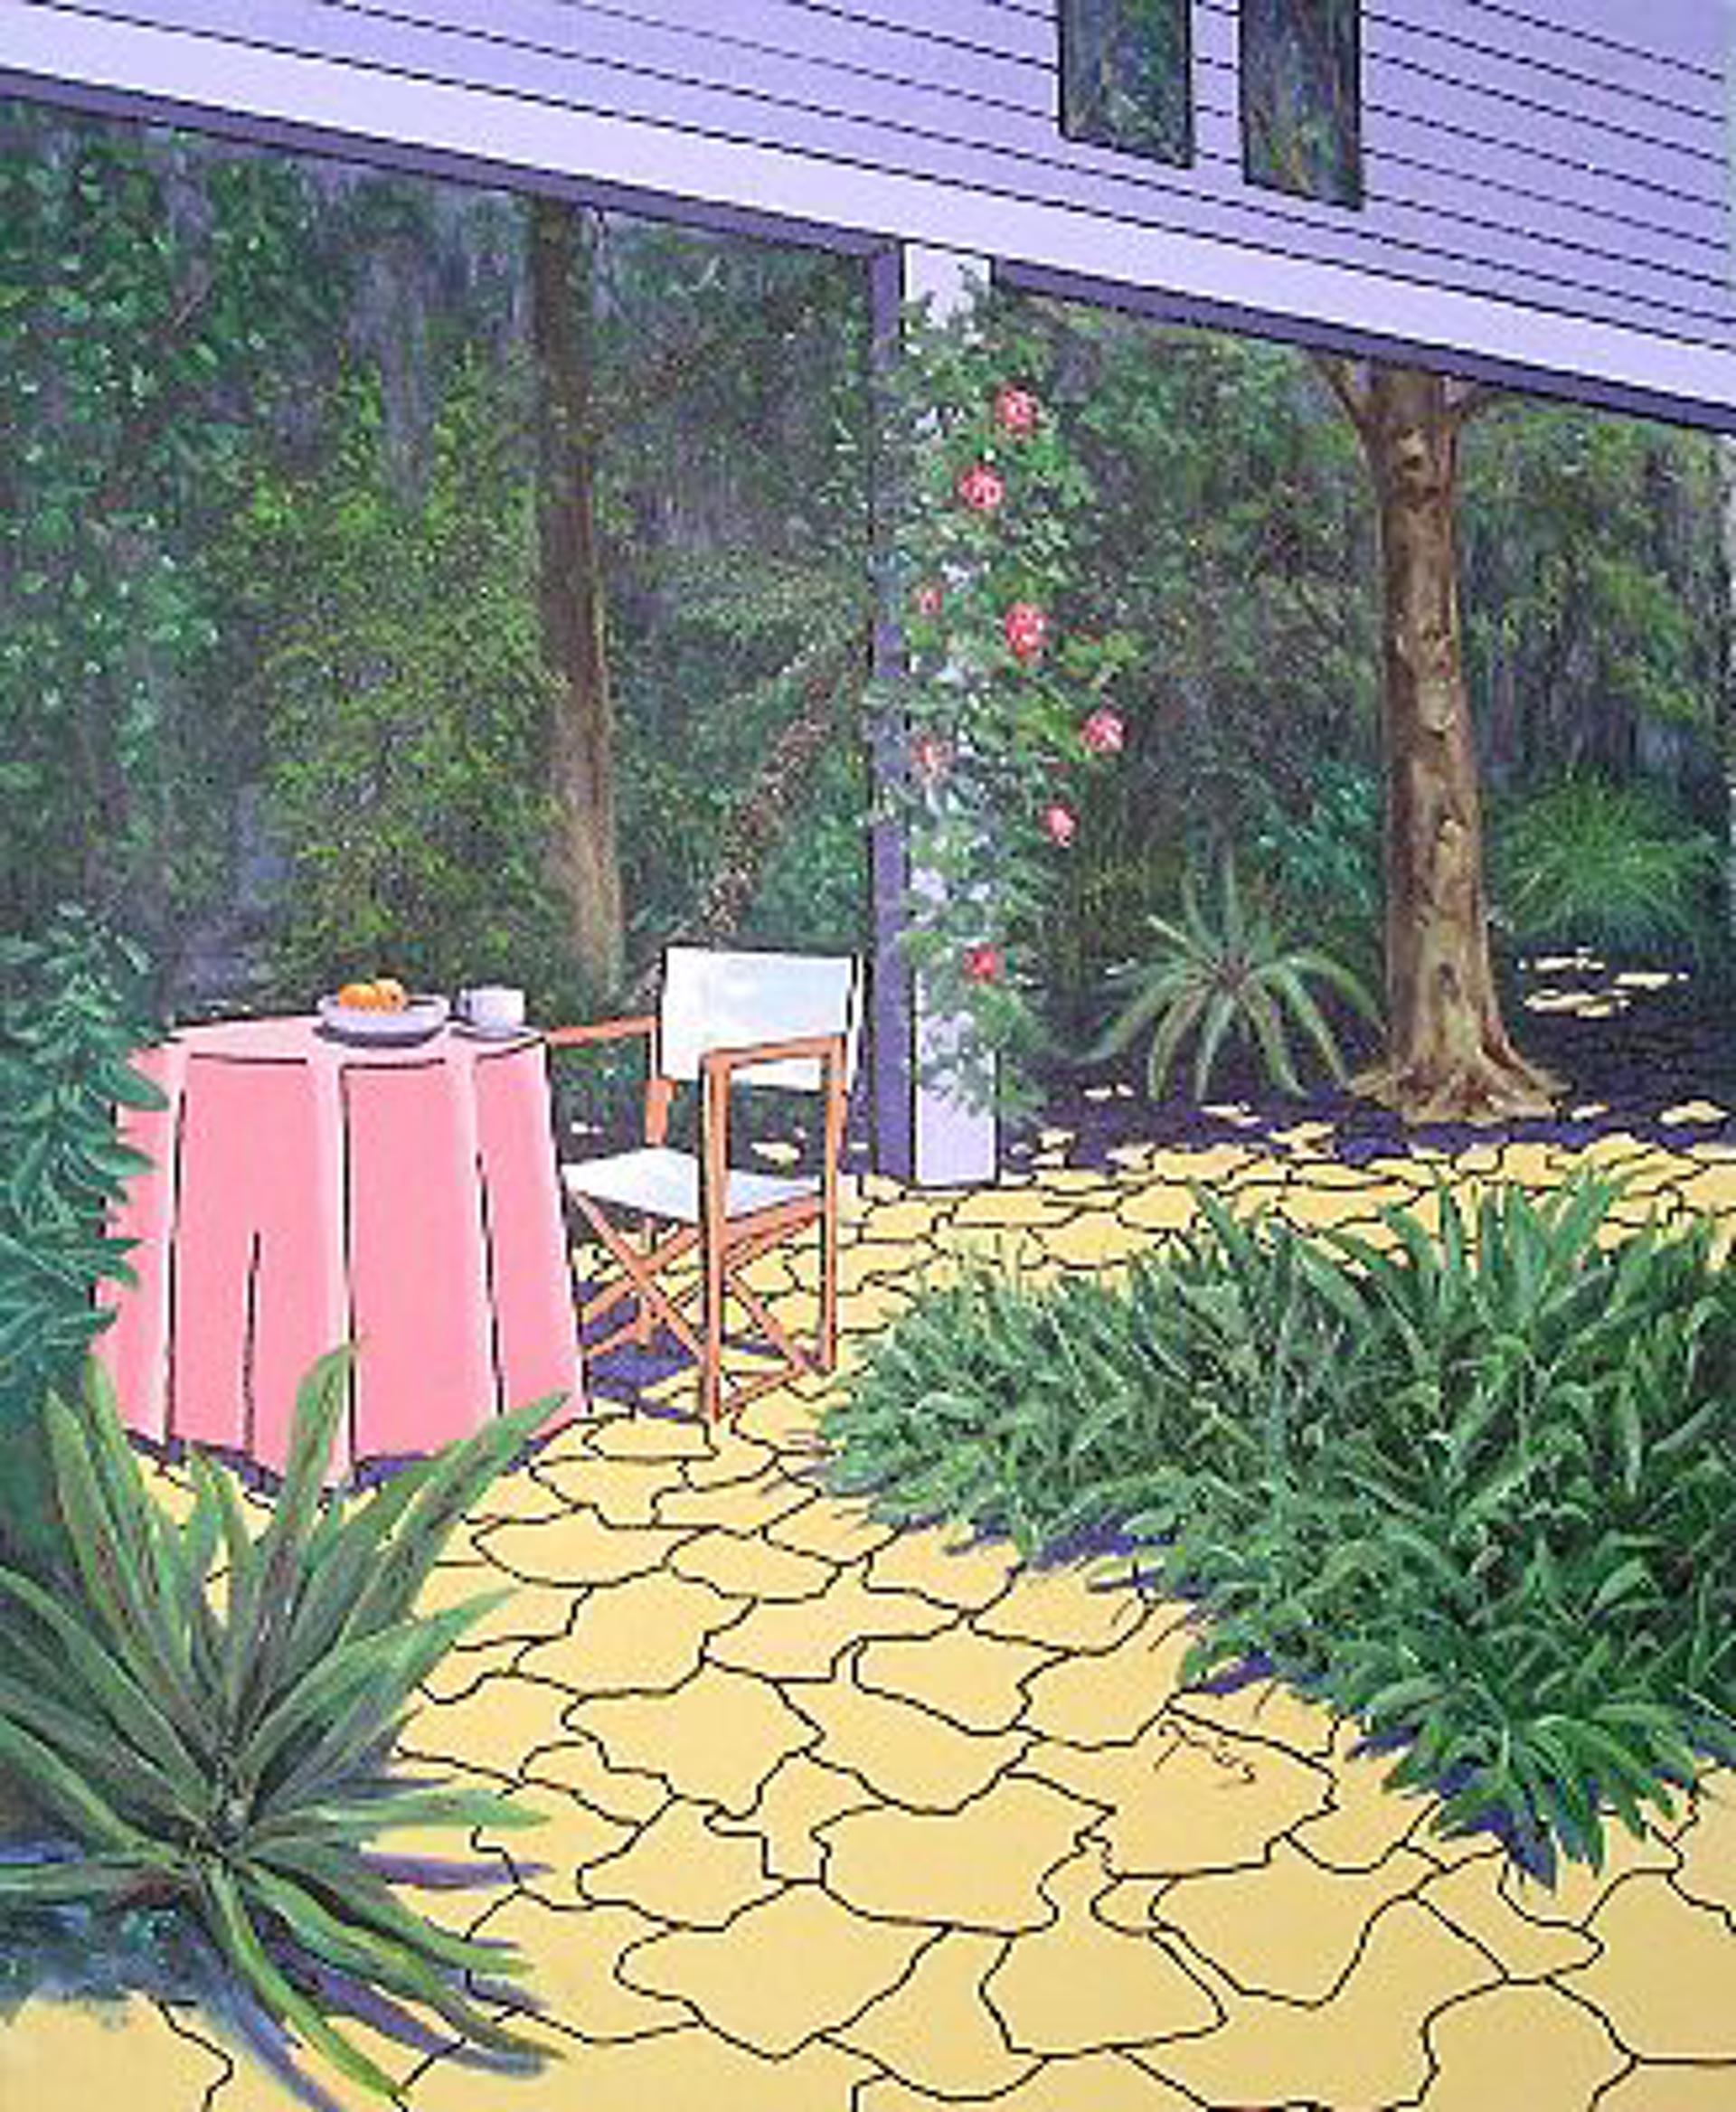 MG044 Breakfast in the Botanical Garden by Mario Garcia Miro